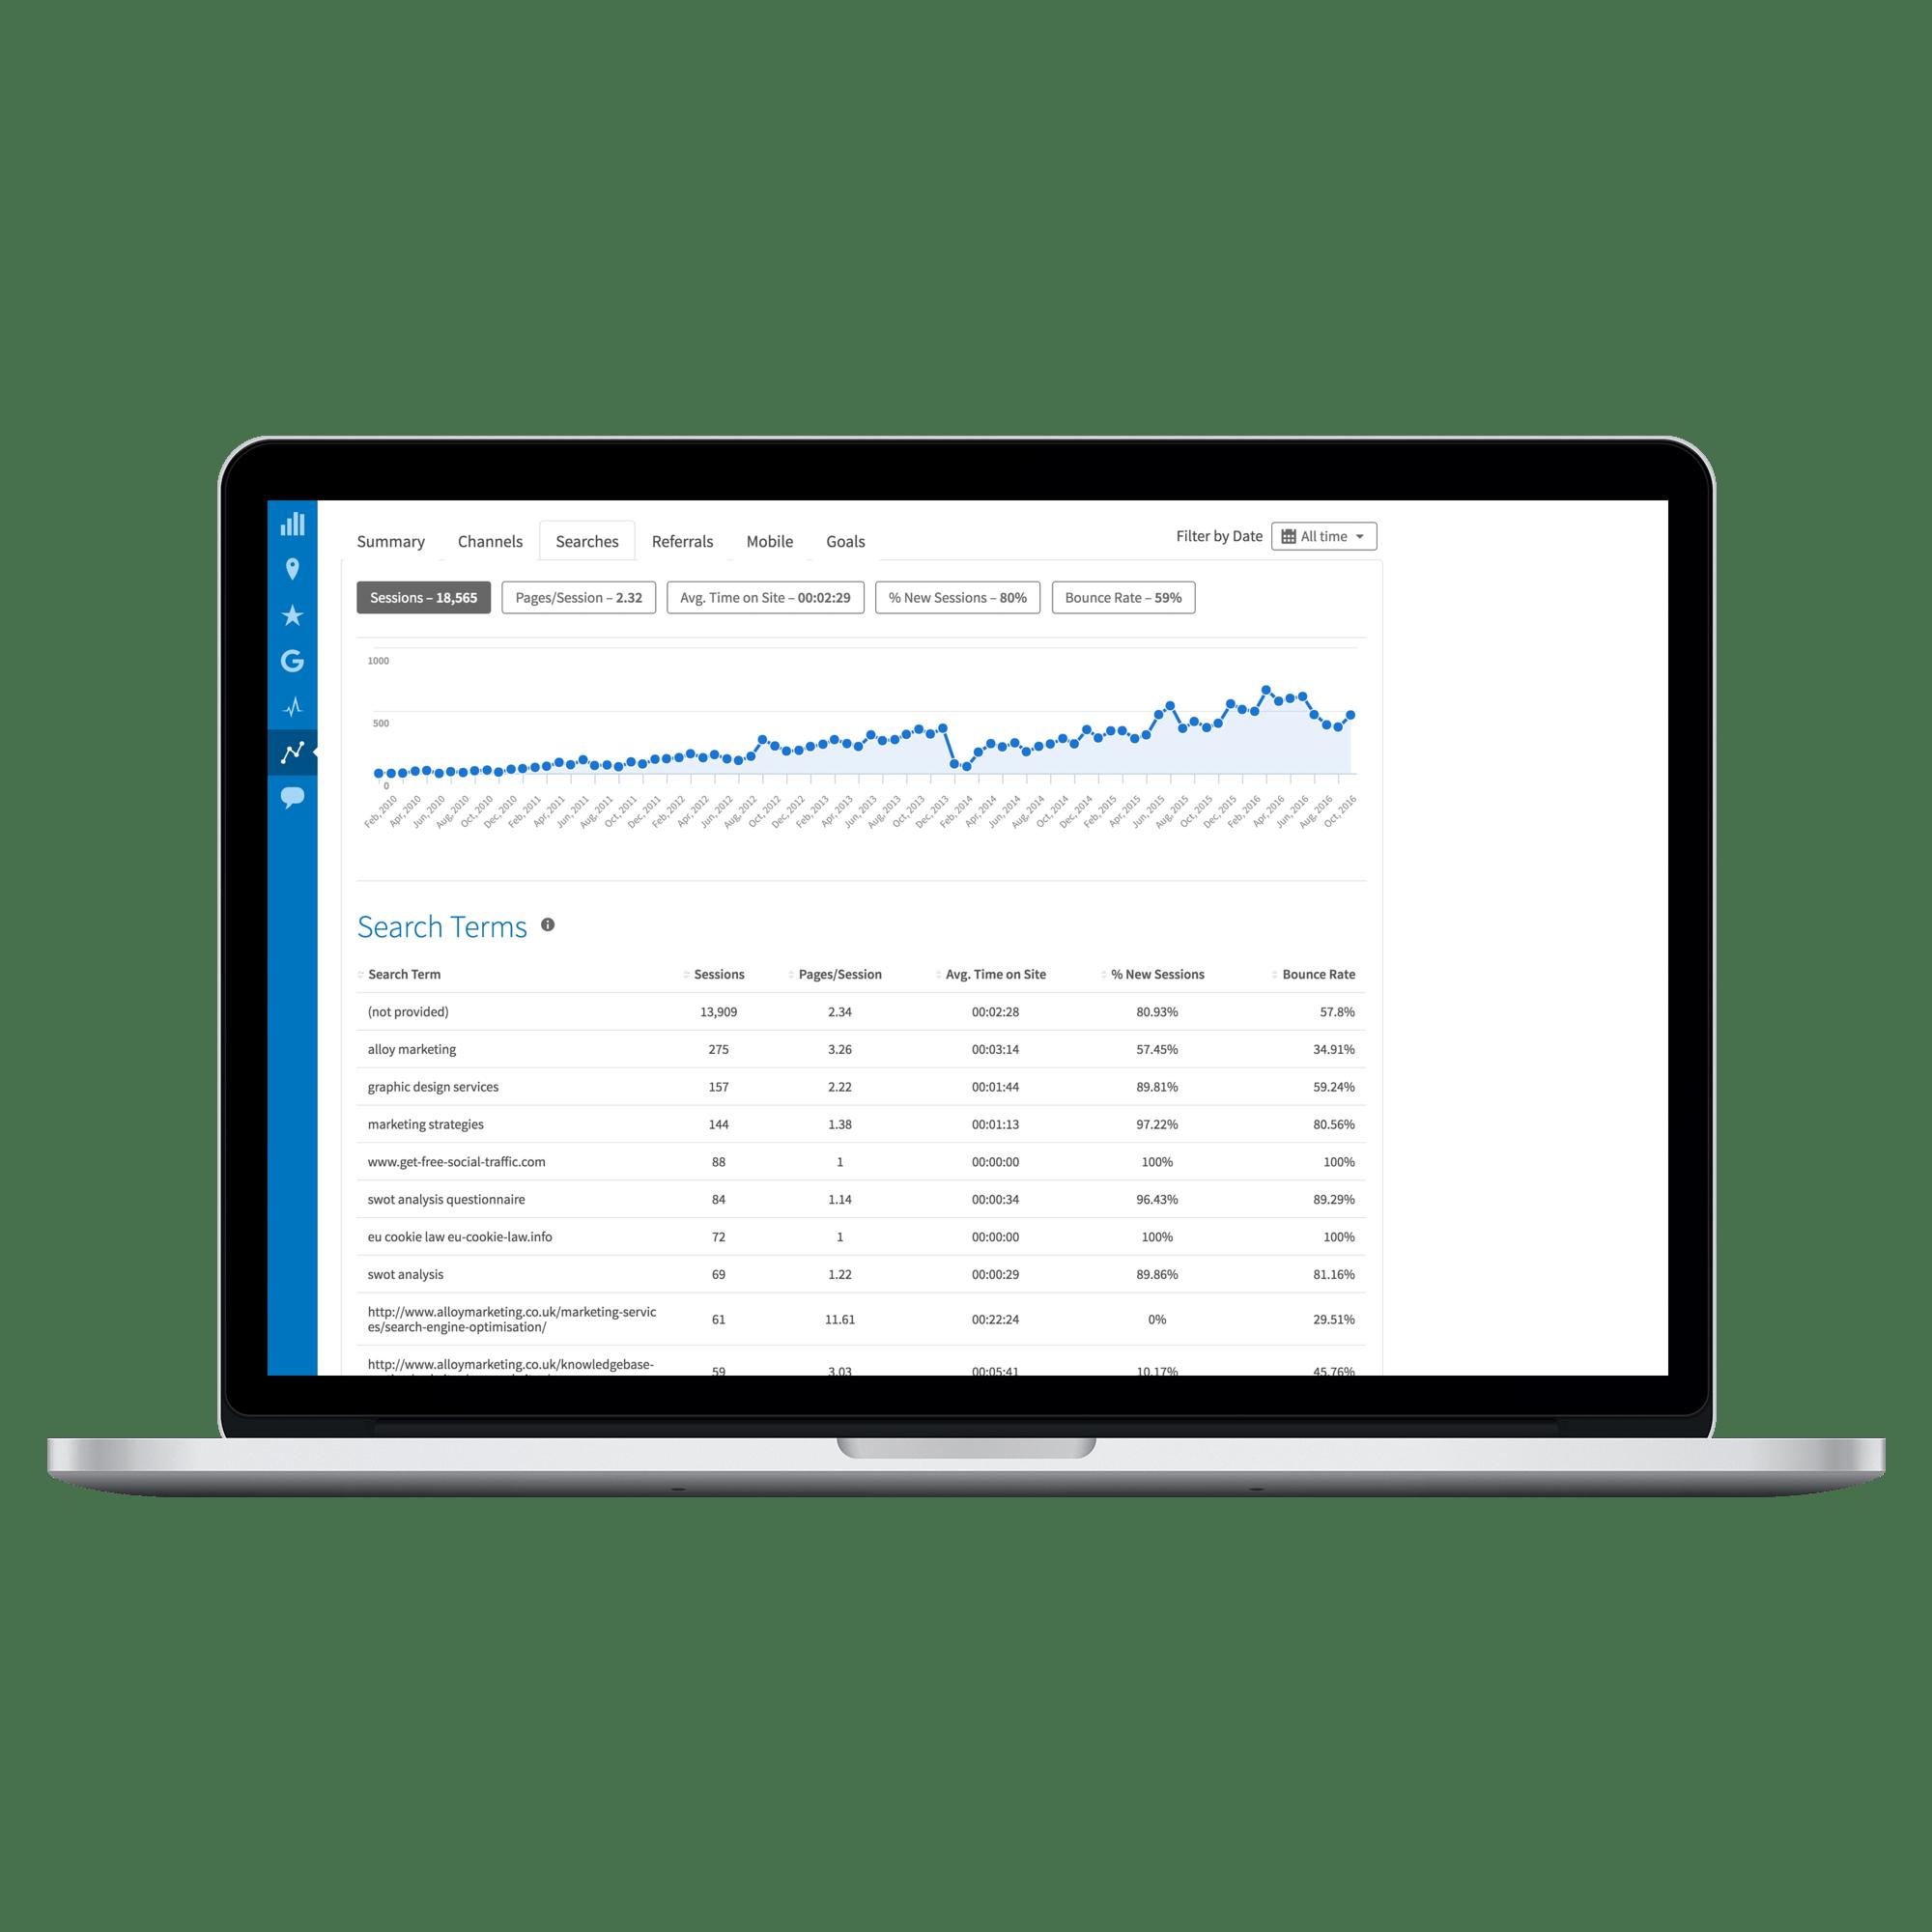 bl seo9 macbookpro15 front - Marketing services